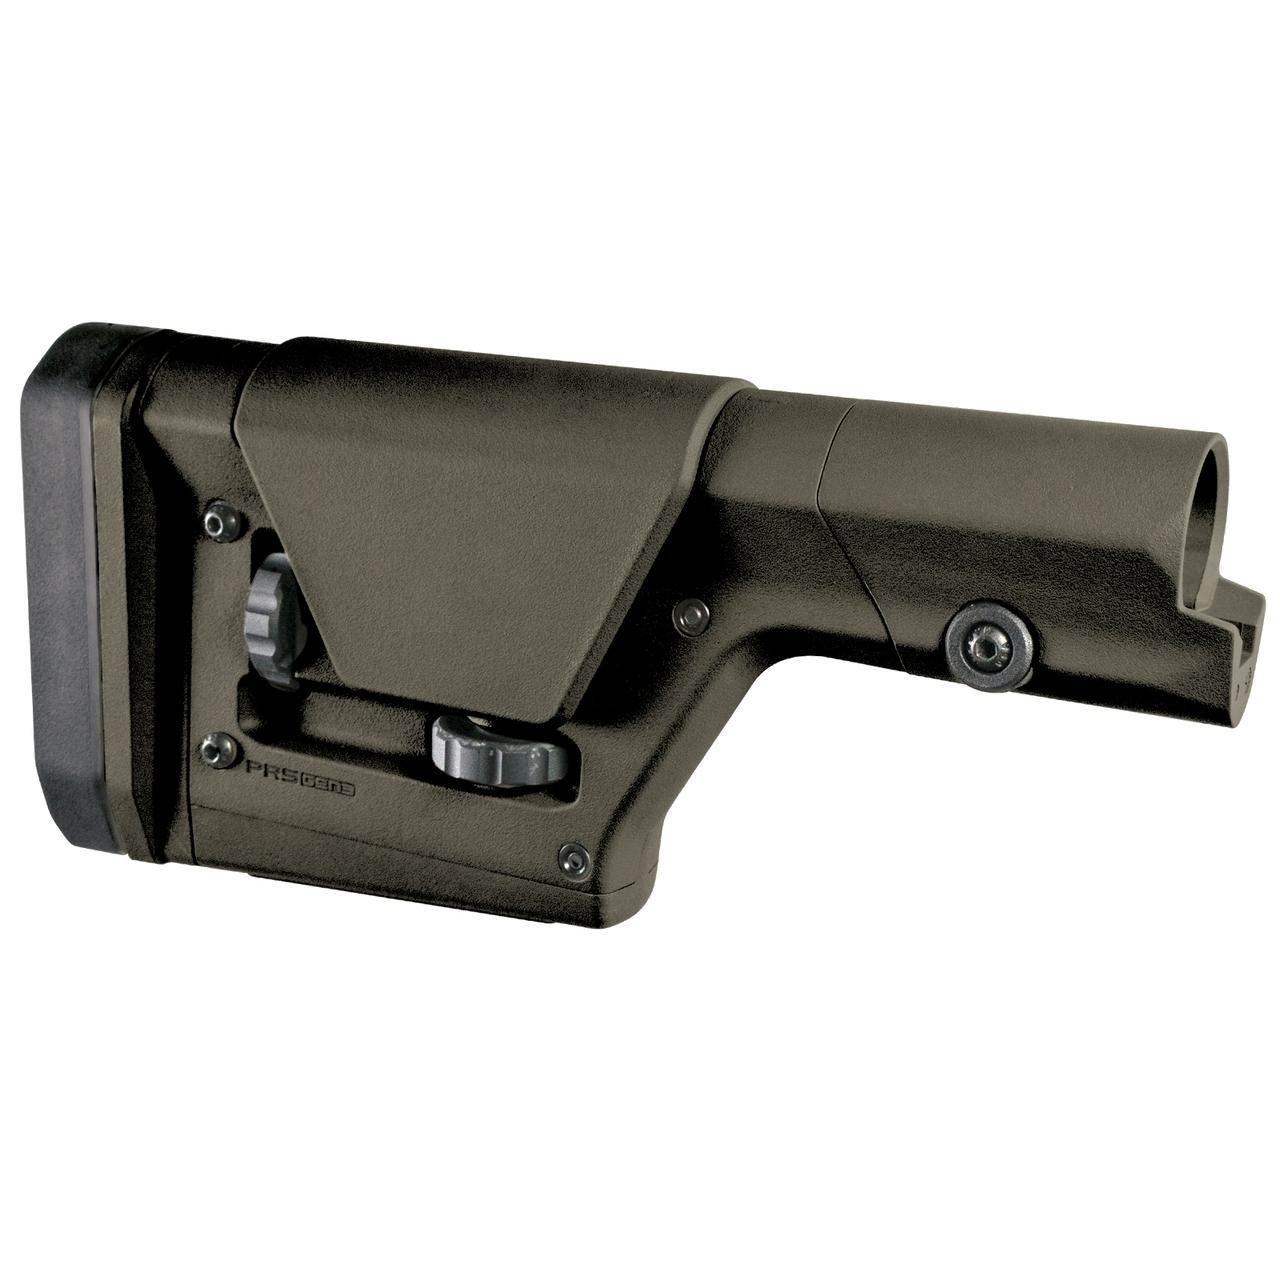 Magpul PRS Gen 3 Precision-Adjustable Stock ODG